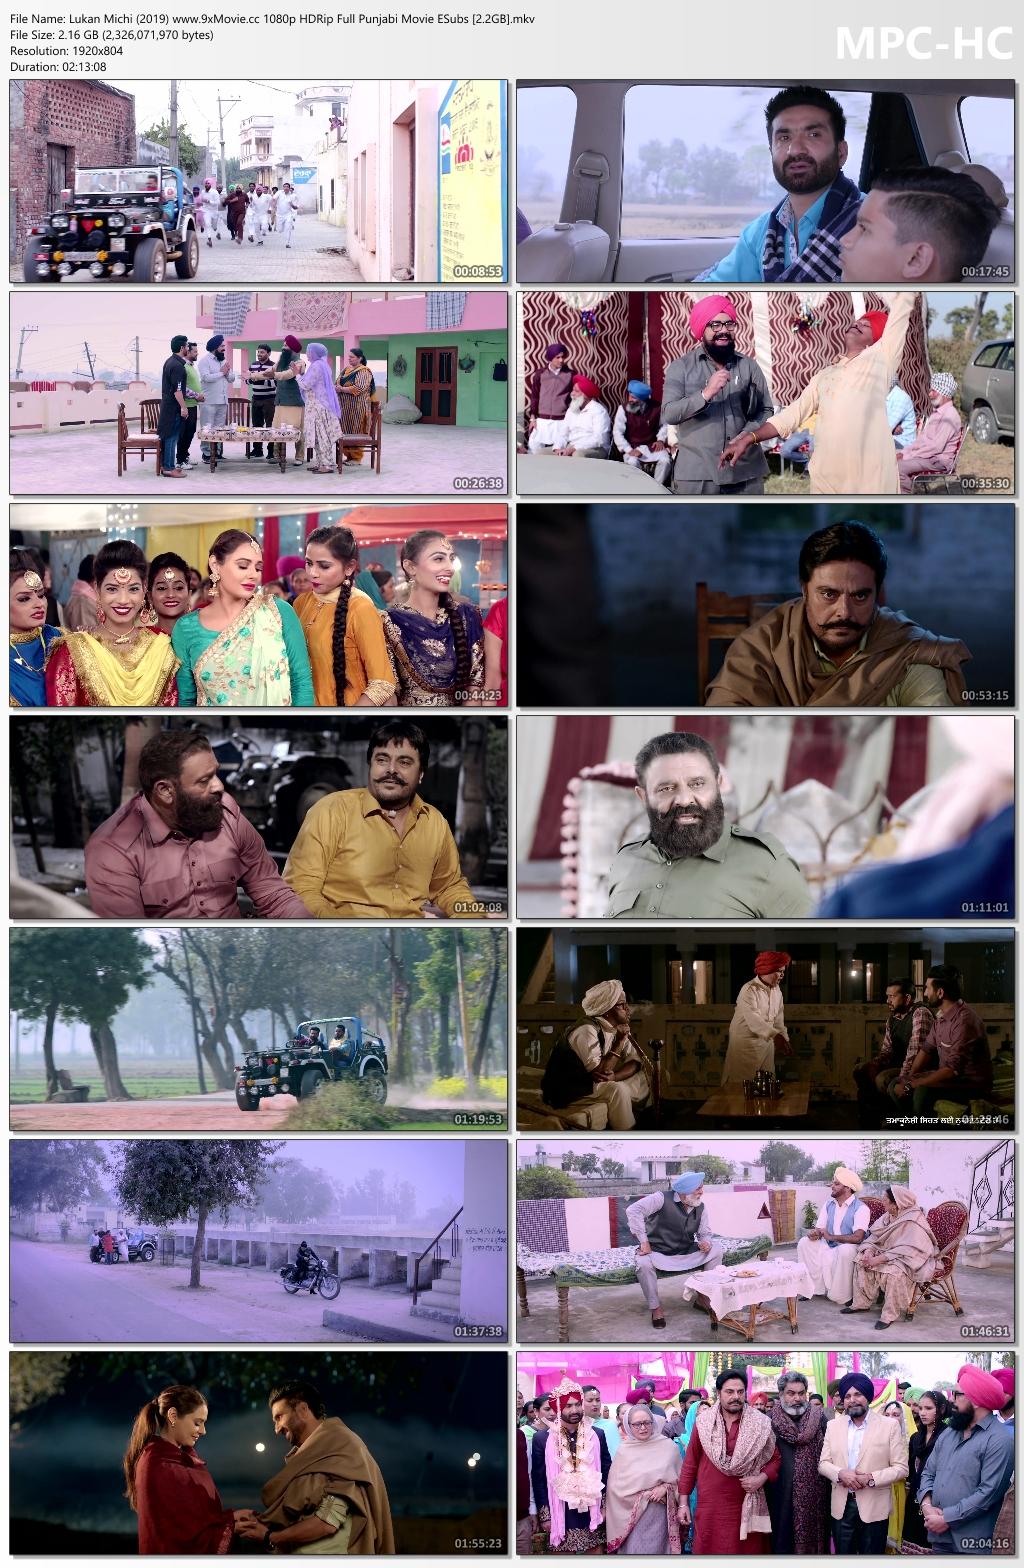 Lukan-Michi-2019-www-9x-Movie-cc-1080p-HDRip-Full-Punjabi-Movie-ESubs-2-2-GB-mkv